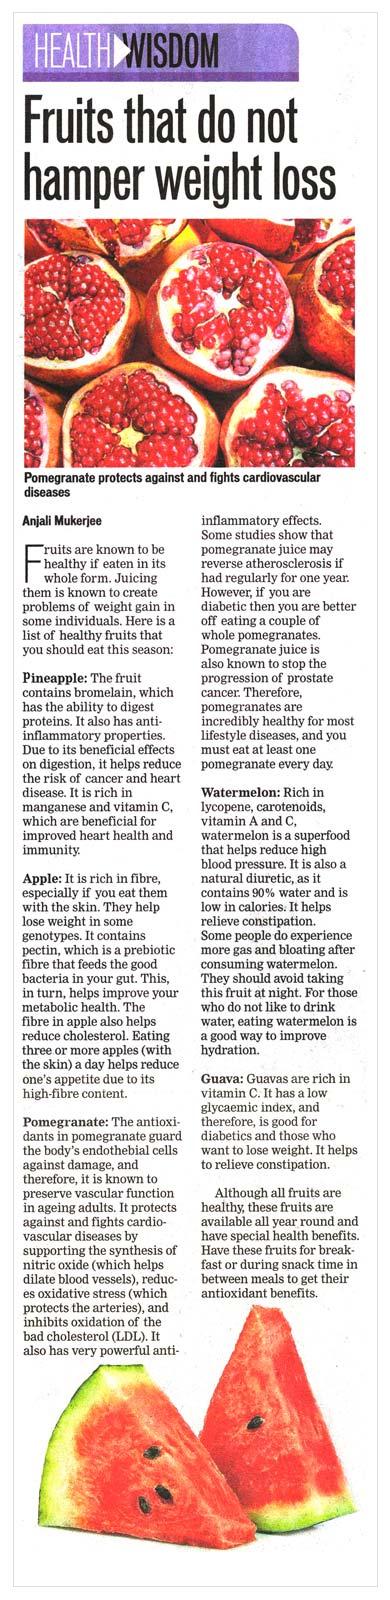 Fruits that do not hamper weight loss